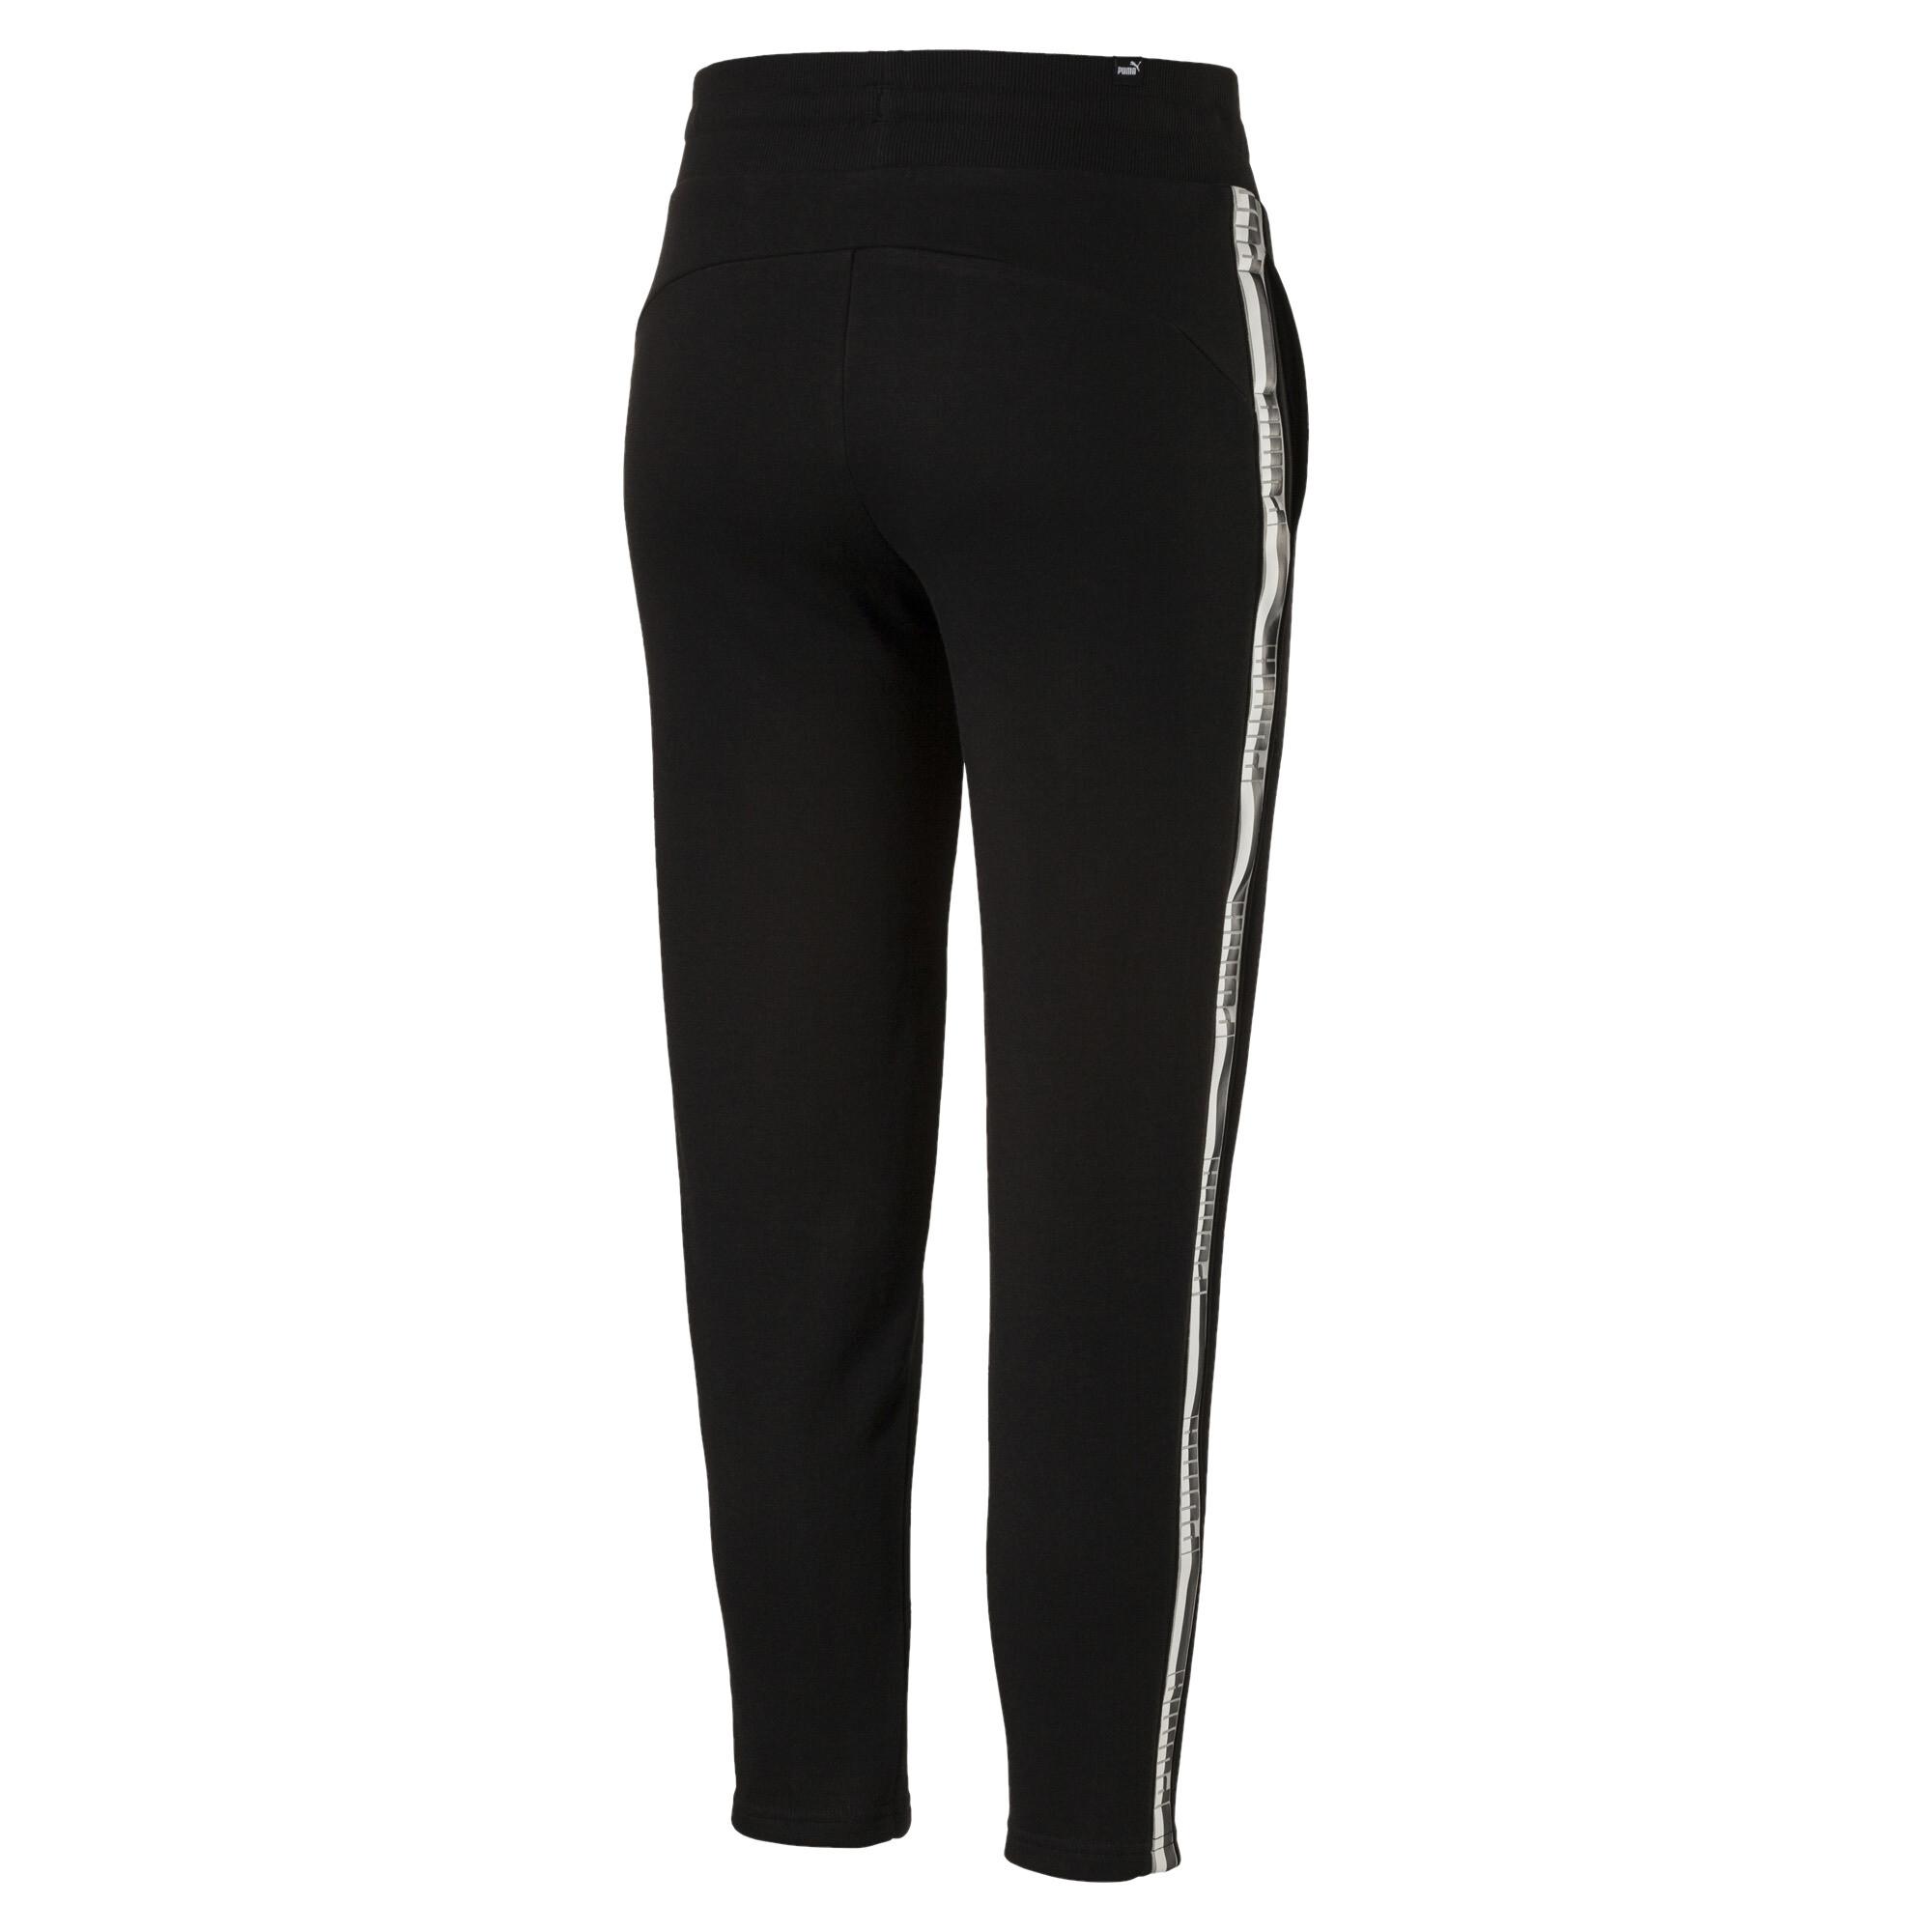 71111f6d36 PUMA Tape Women's Pants Women Knitted Pants Basics | eBay